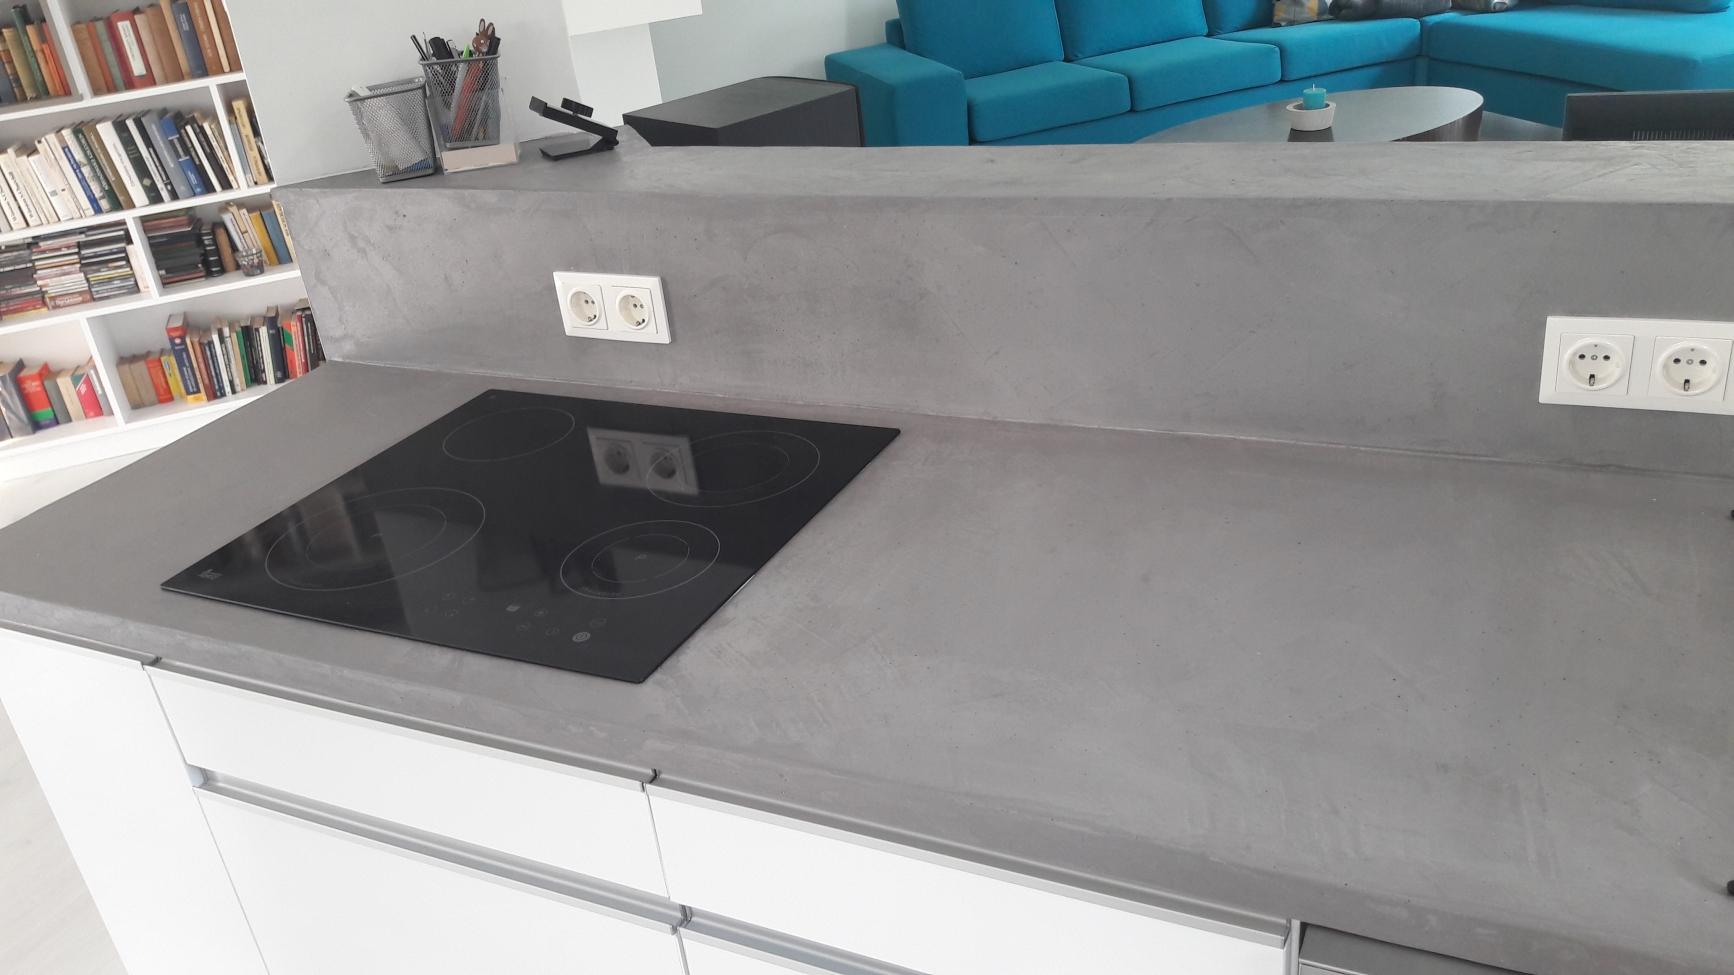 Harmony beton konyhapult s beton munkalap referenci k beton design l tsz beton fel letek - Harmonie beton ...